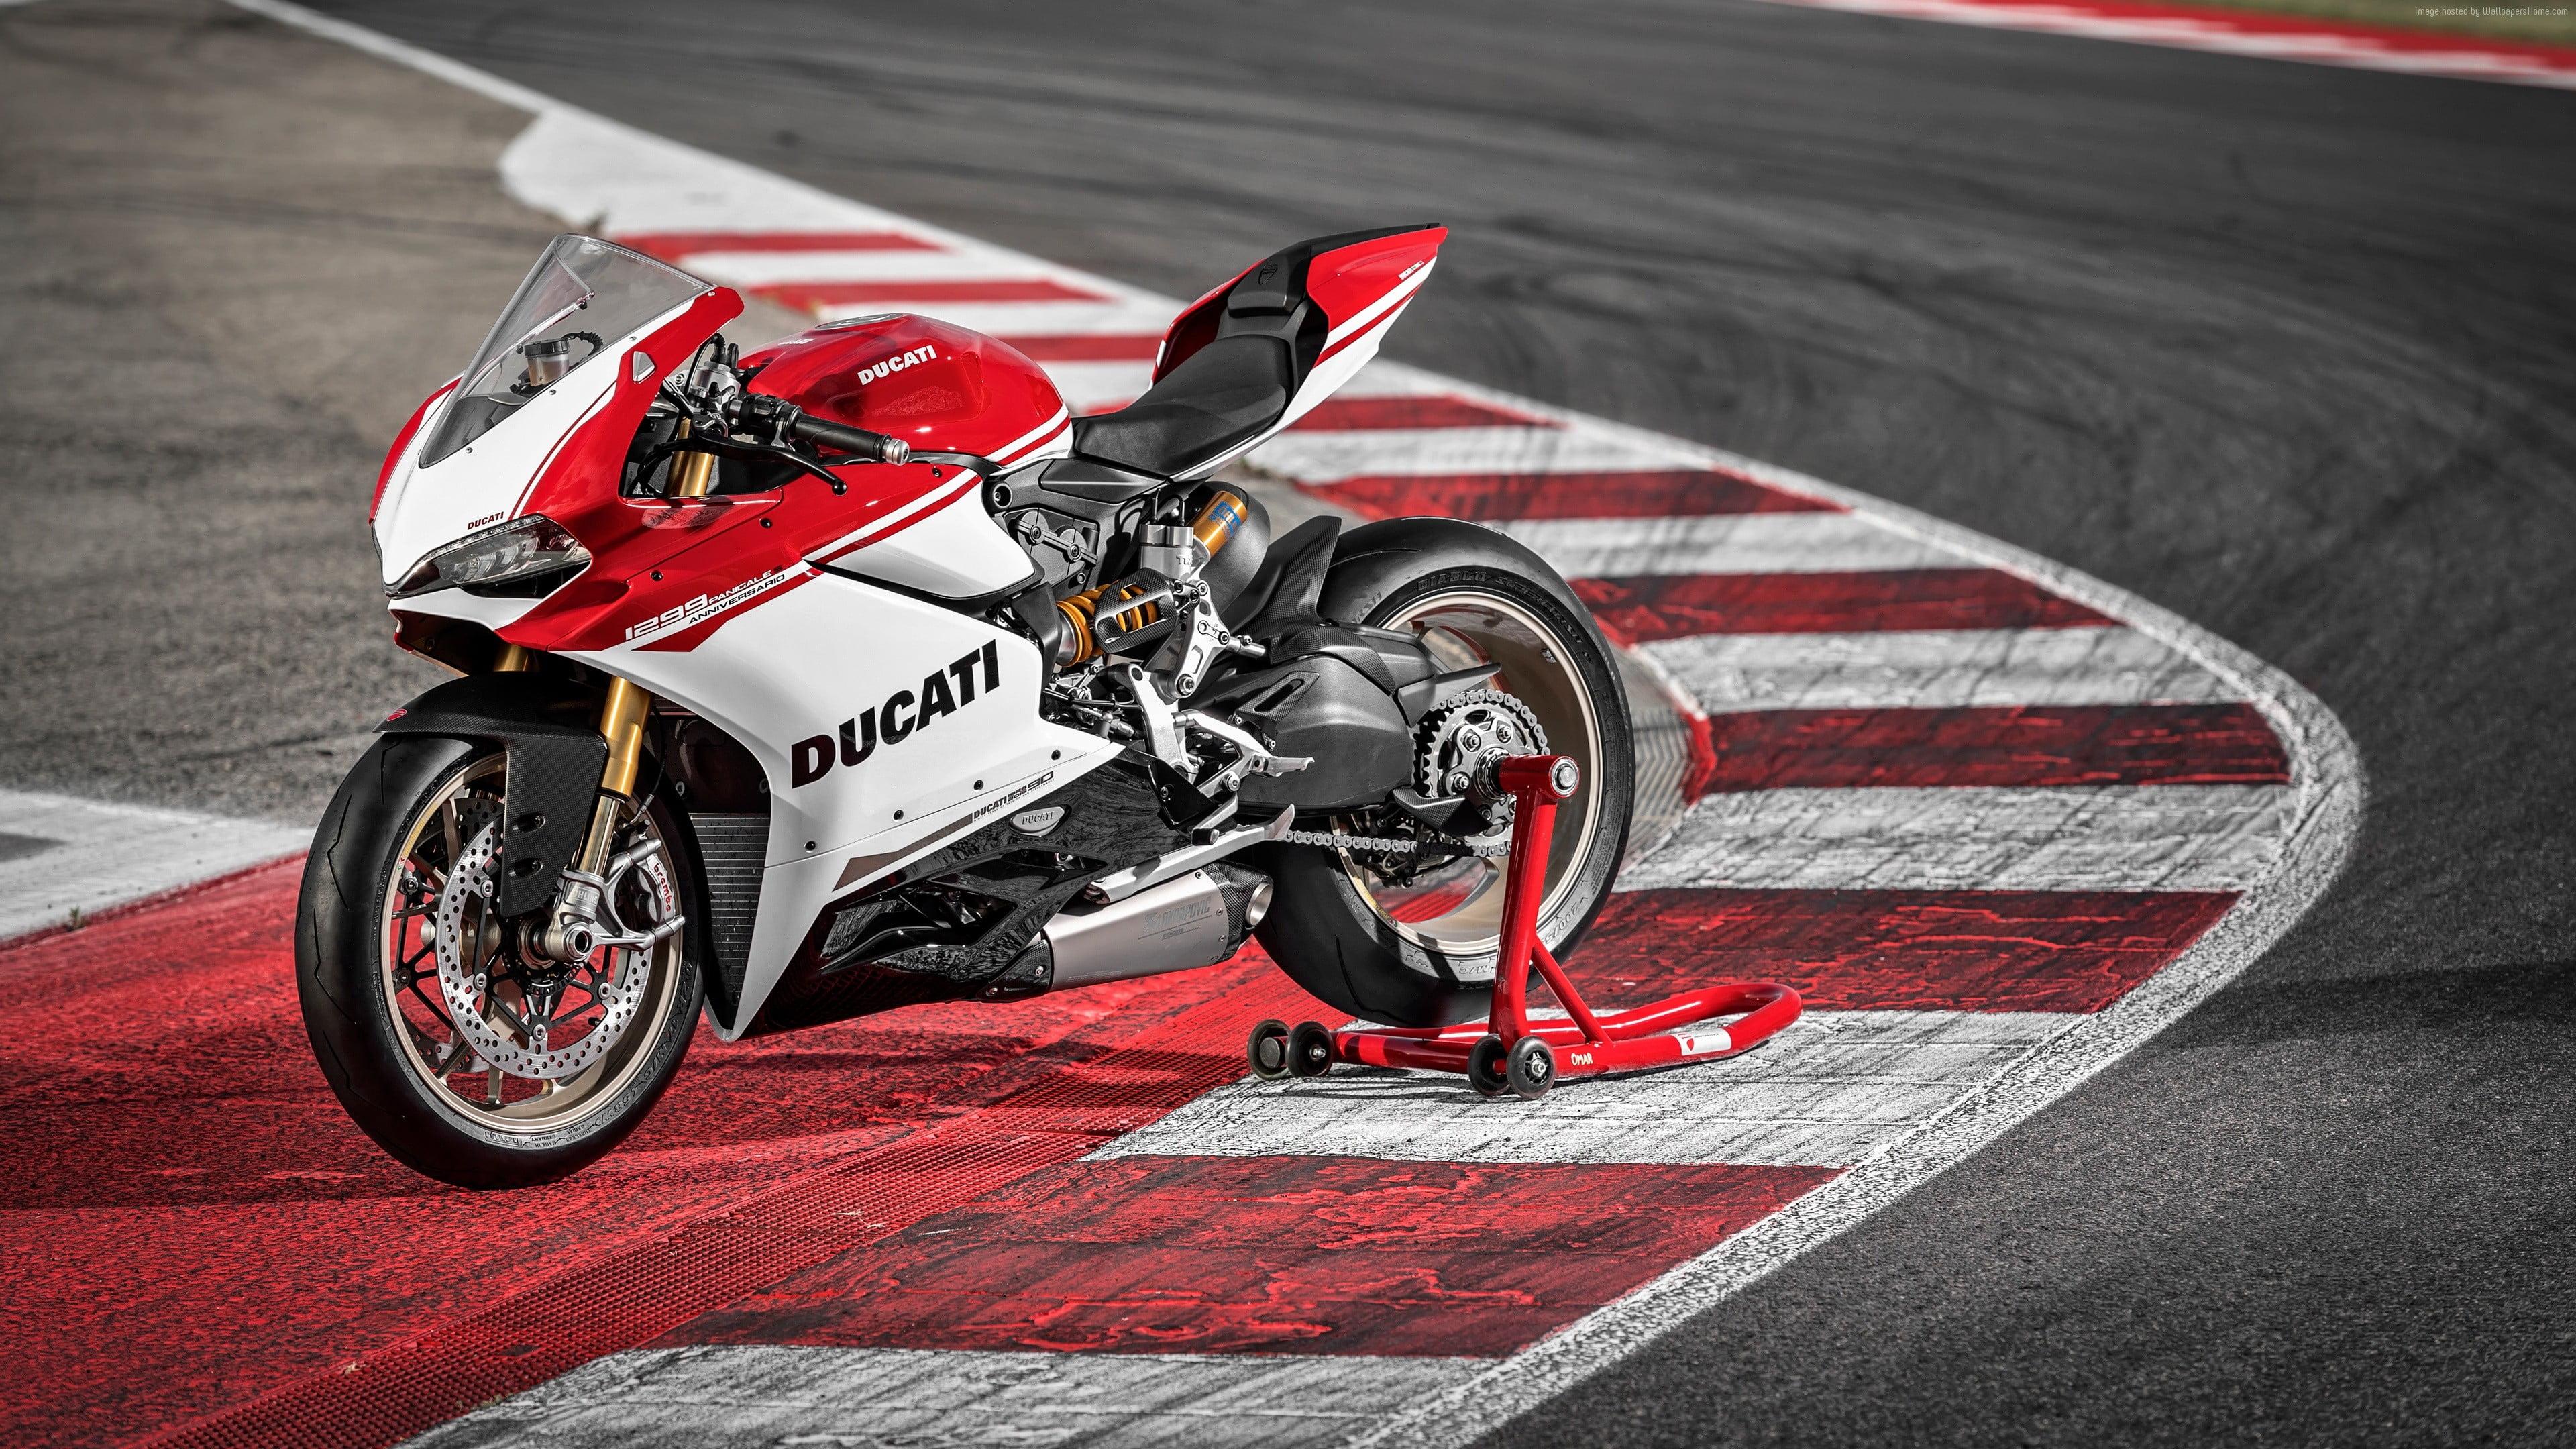 Red and white Ducati sports bike HD wallpaper Wallpaper Flare 3840x2160